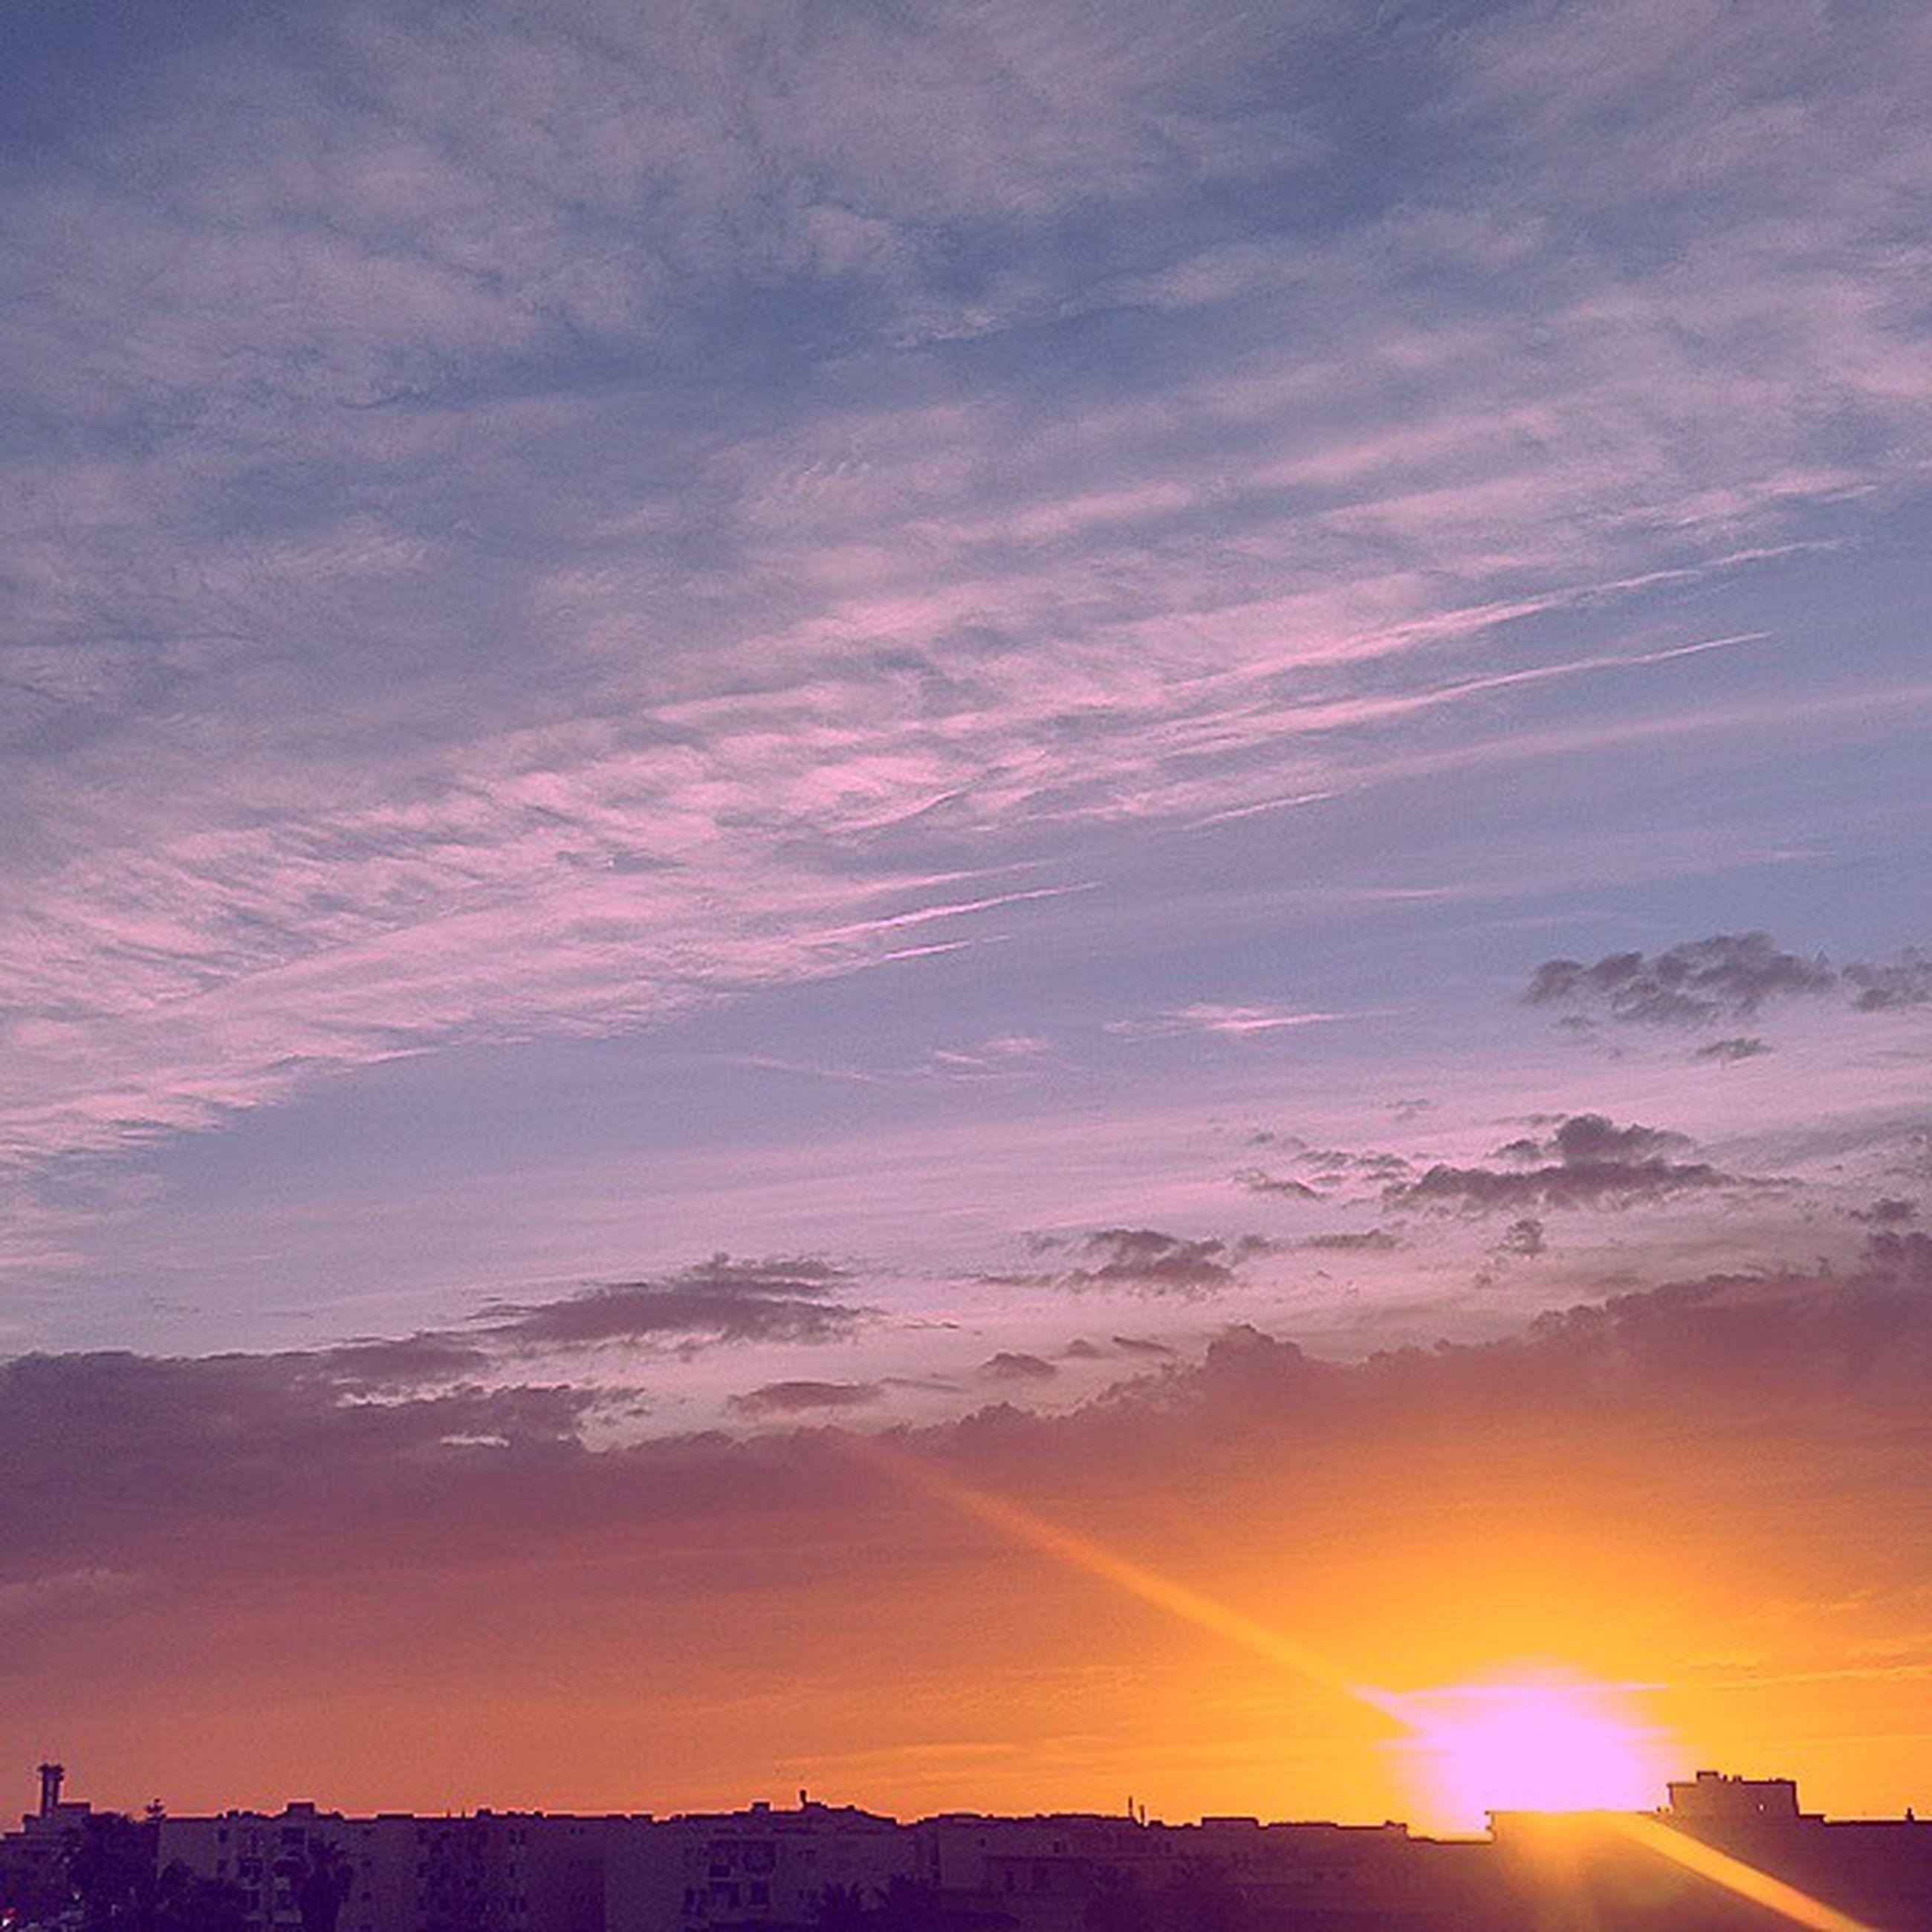 sunset, sun, silhouette, sky, scenics, beauty in nature, sunbeam, tranquil scene, tranquility, sunlight, cloud - sky, orange color, nature, idyllic, landscape, lens flare, cloud, outdoors, no people, back lit